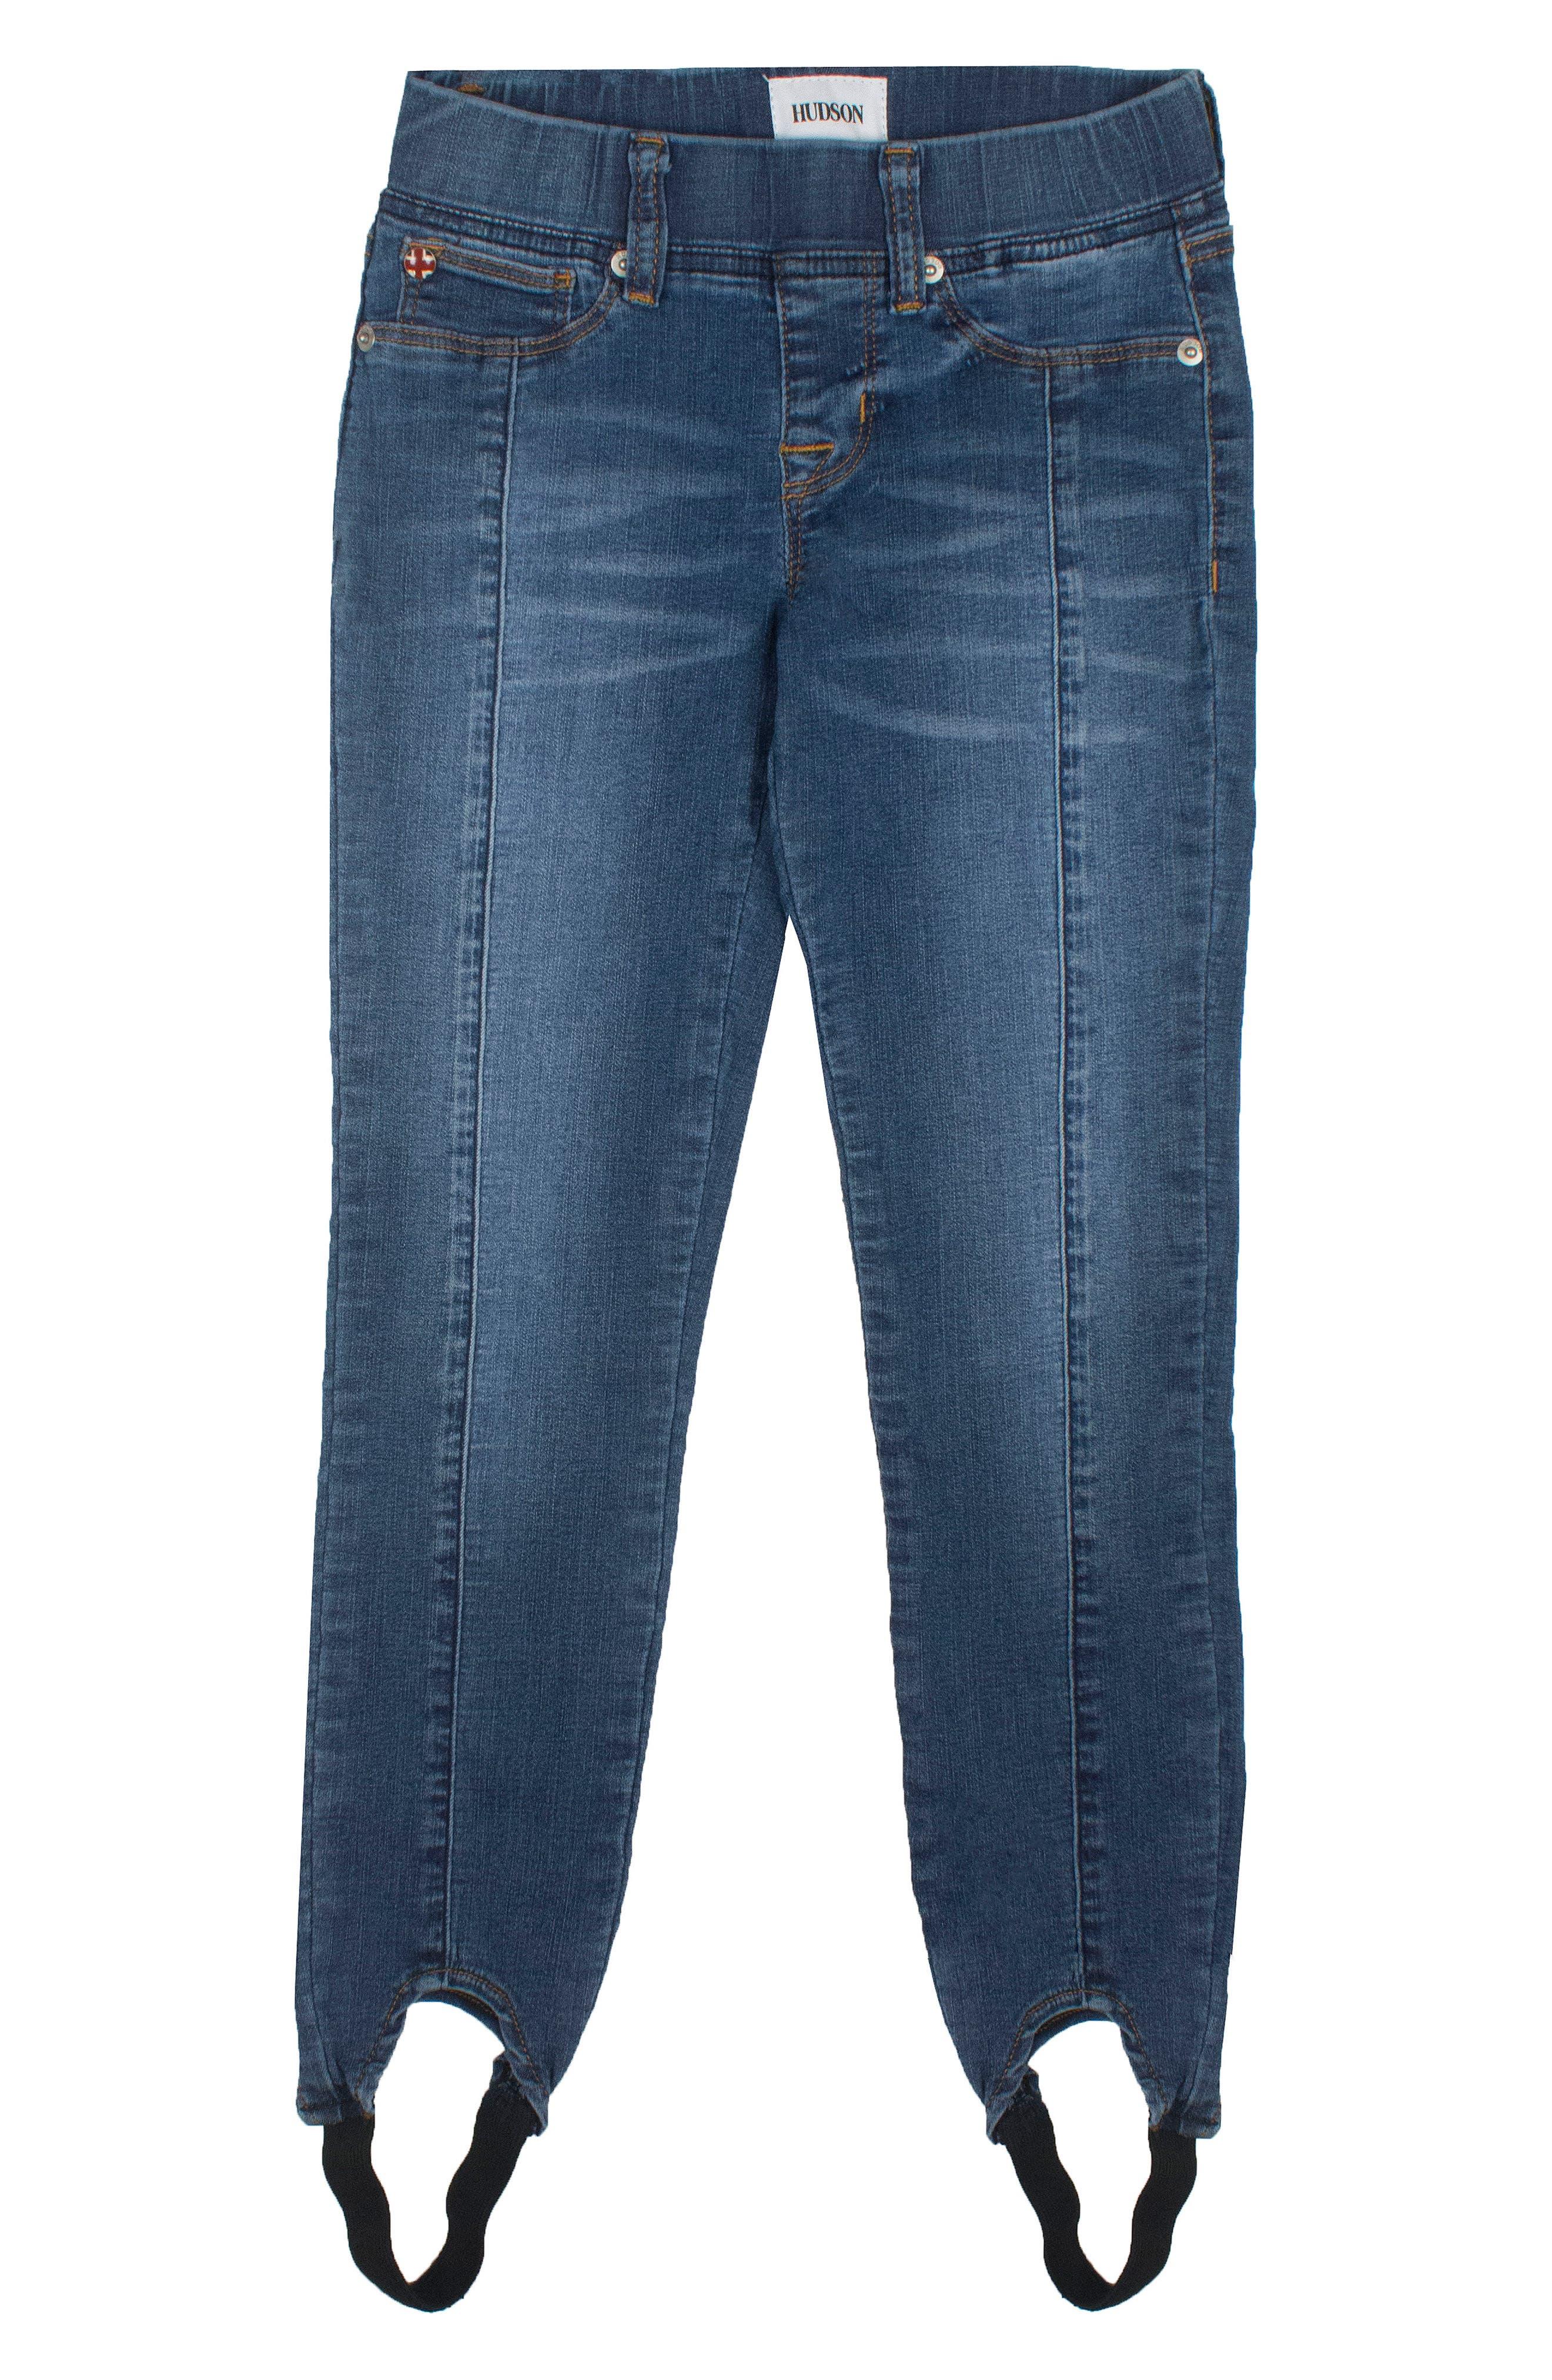 Main Image - Hudson Kids Rosa Stirrup Jeans (Big Girls)